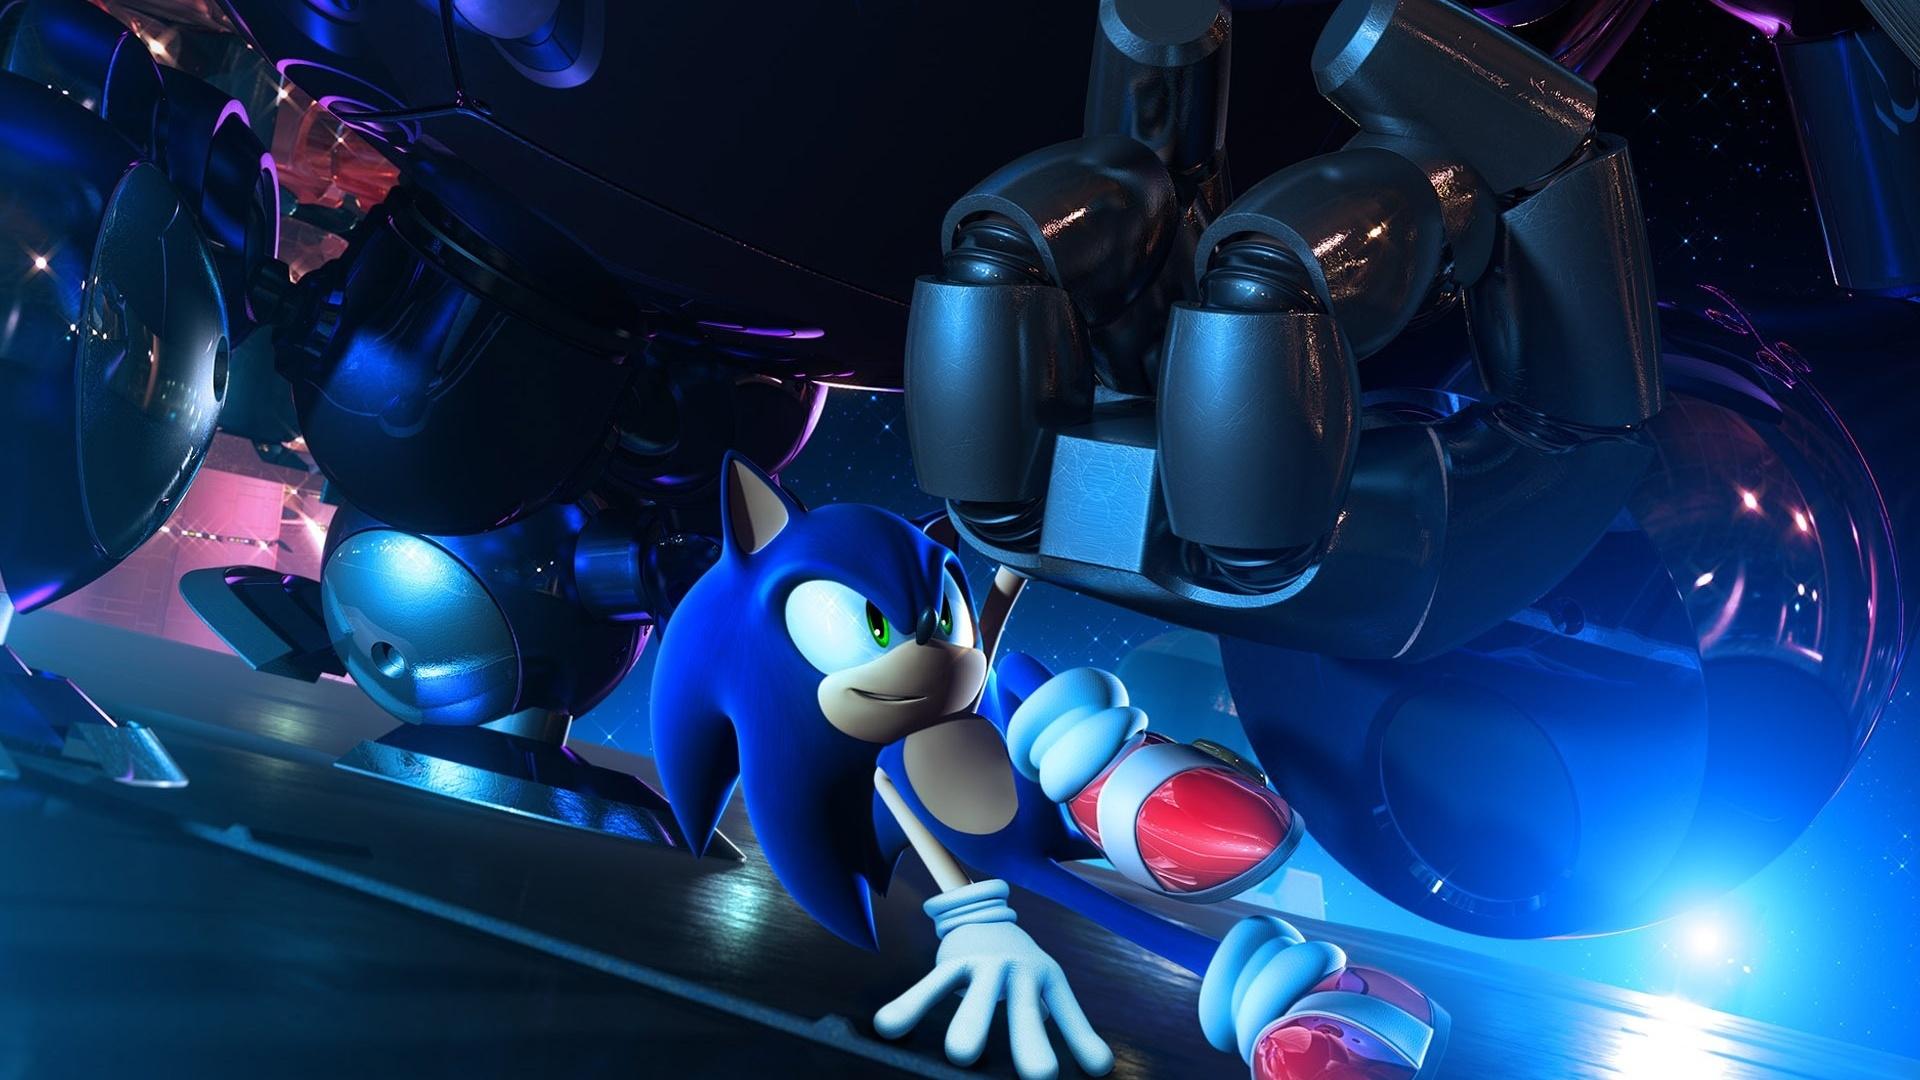 ws_Sonic_the_Hedgehog_1920x1080